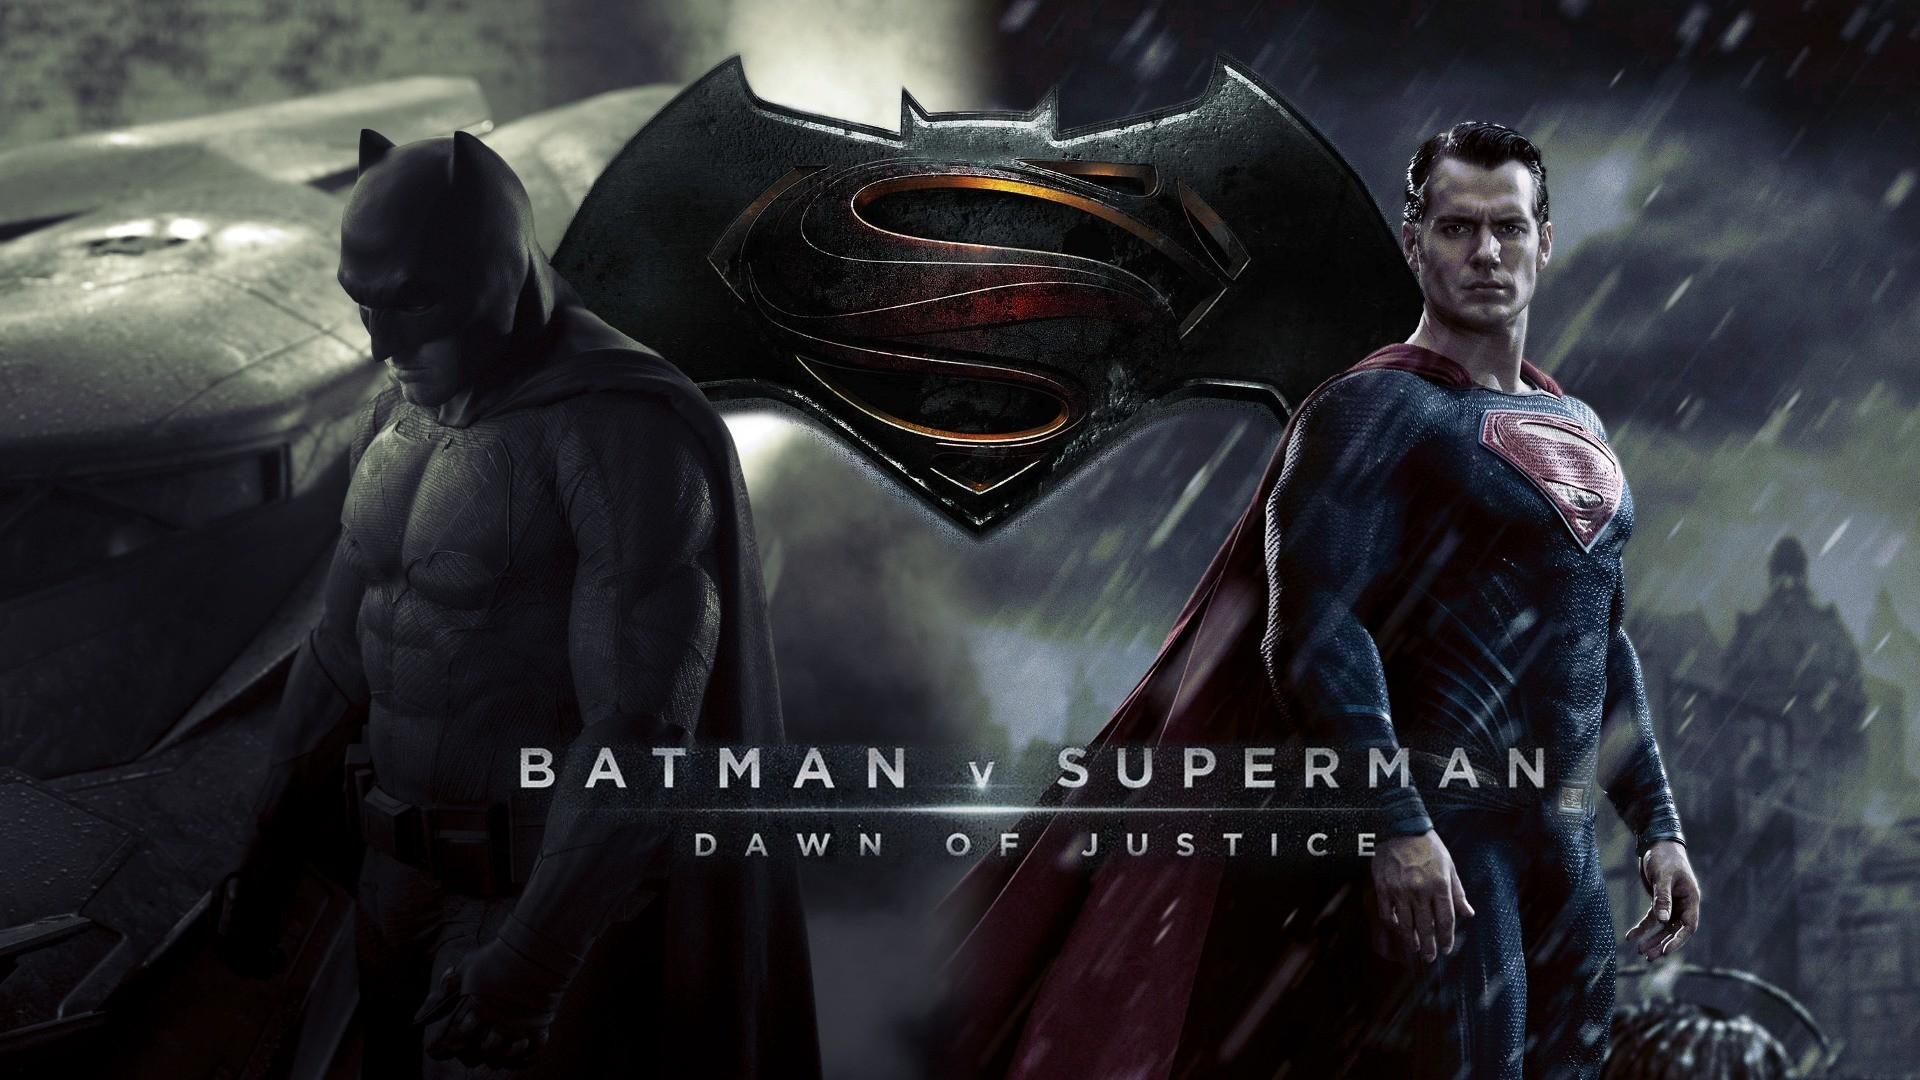 Superman vs Batman Wallpaper https://wallpaperazzi.net/2015/12/